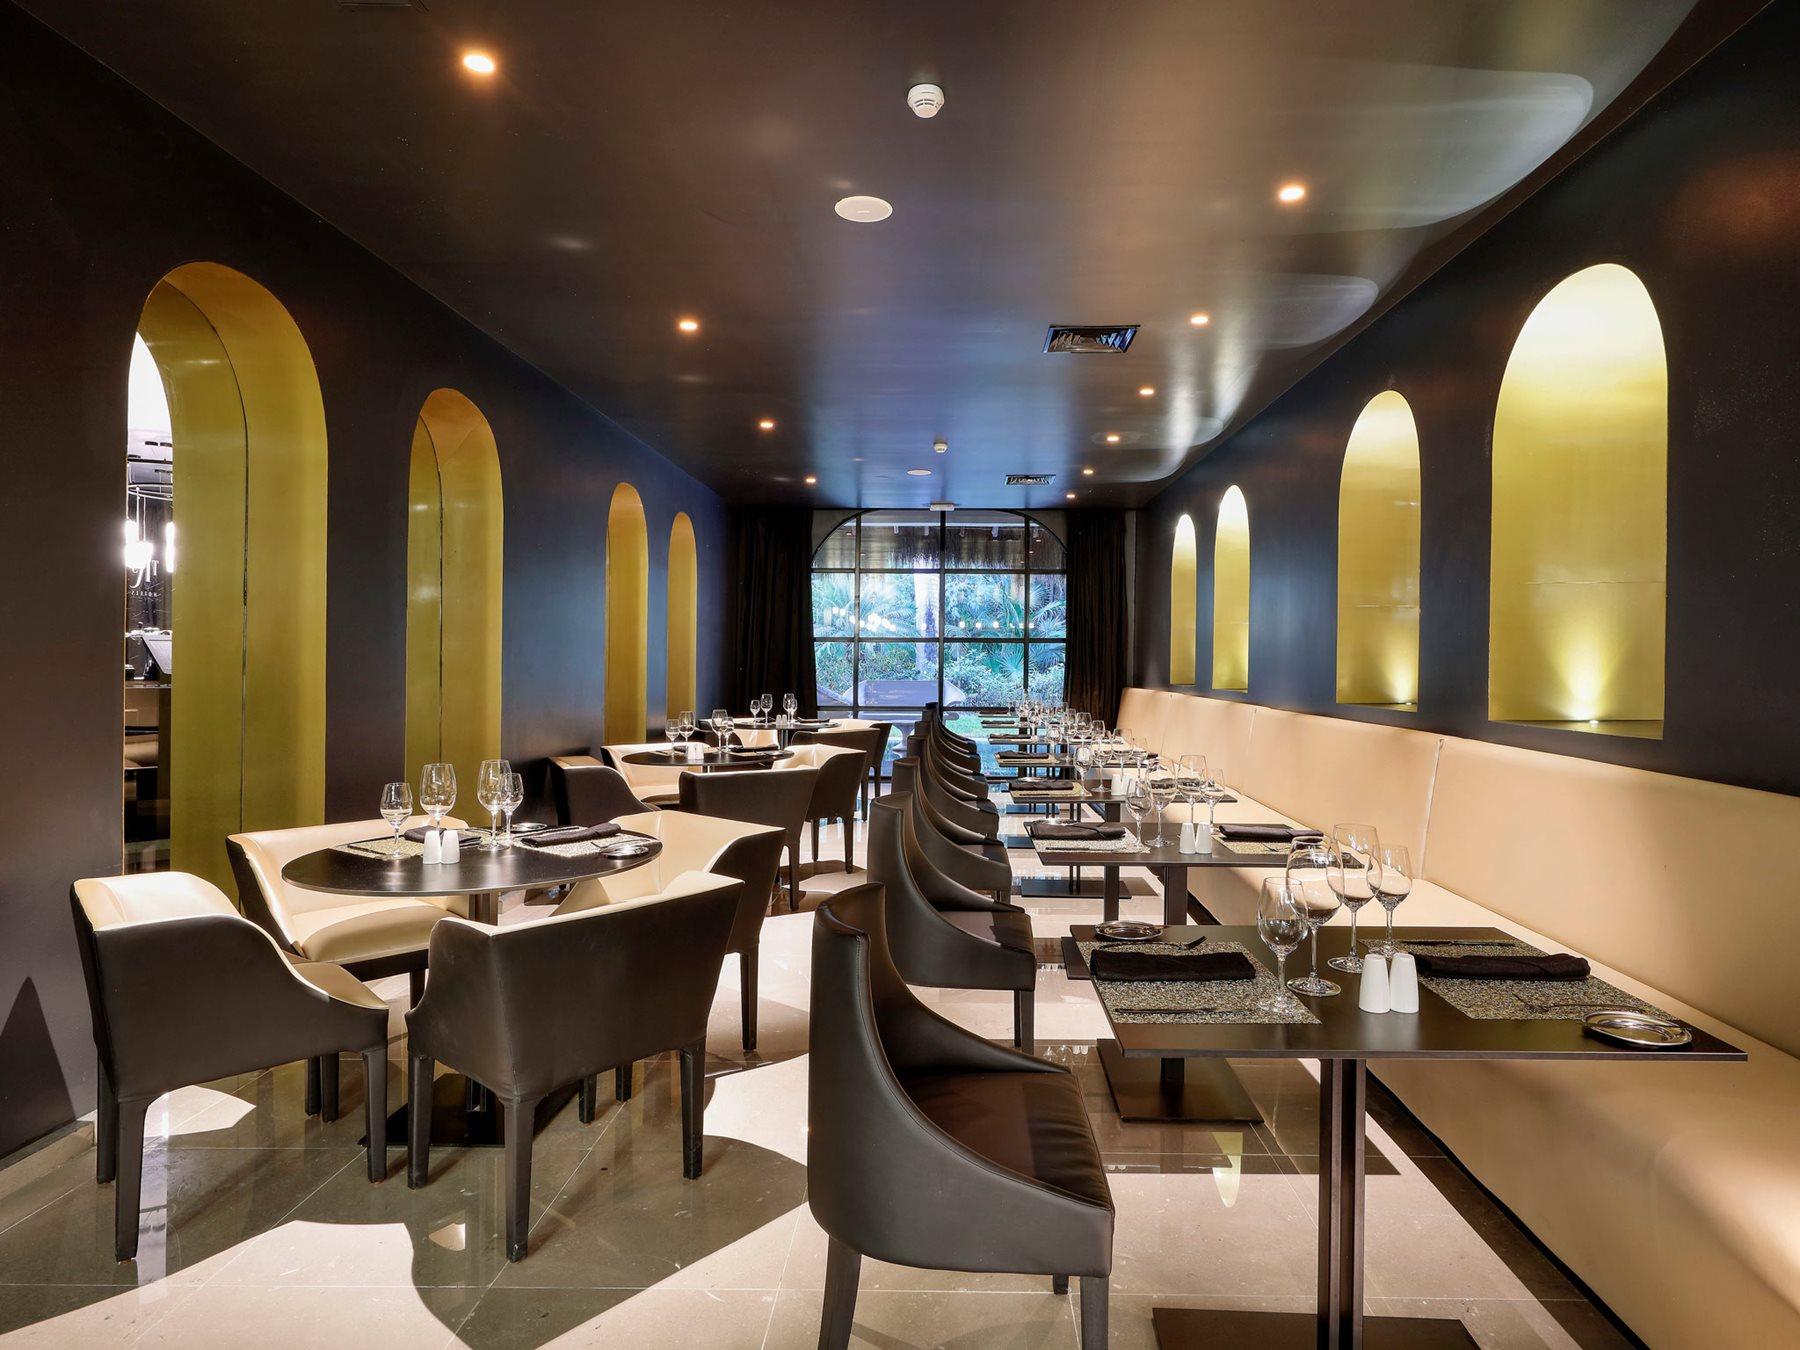 RIV-The-Royal-Suites-Yucatan-Restaurant-Italian-001-Render